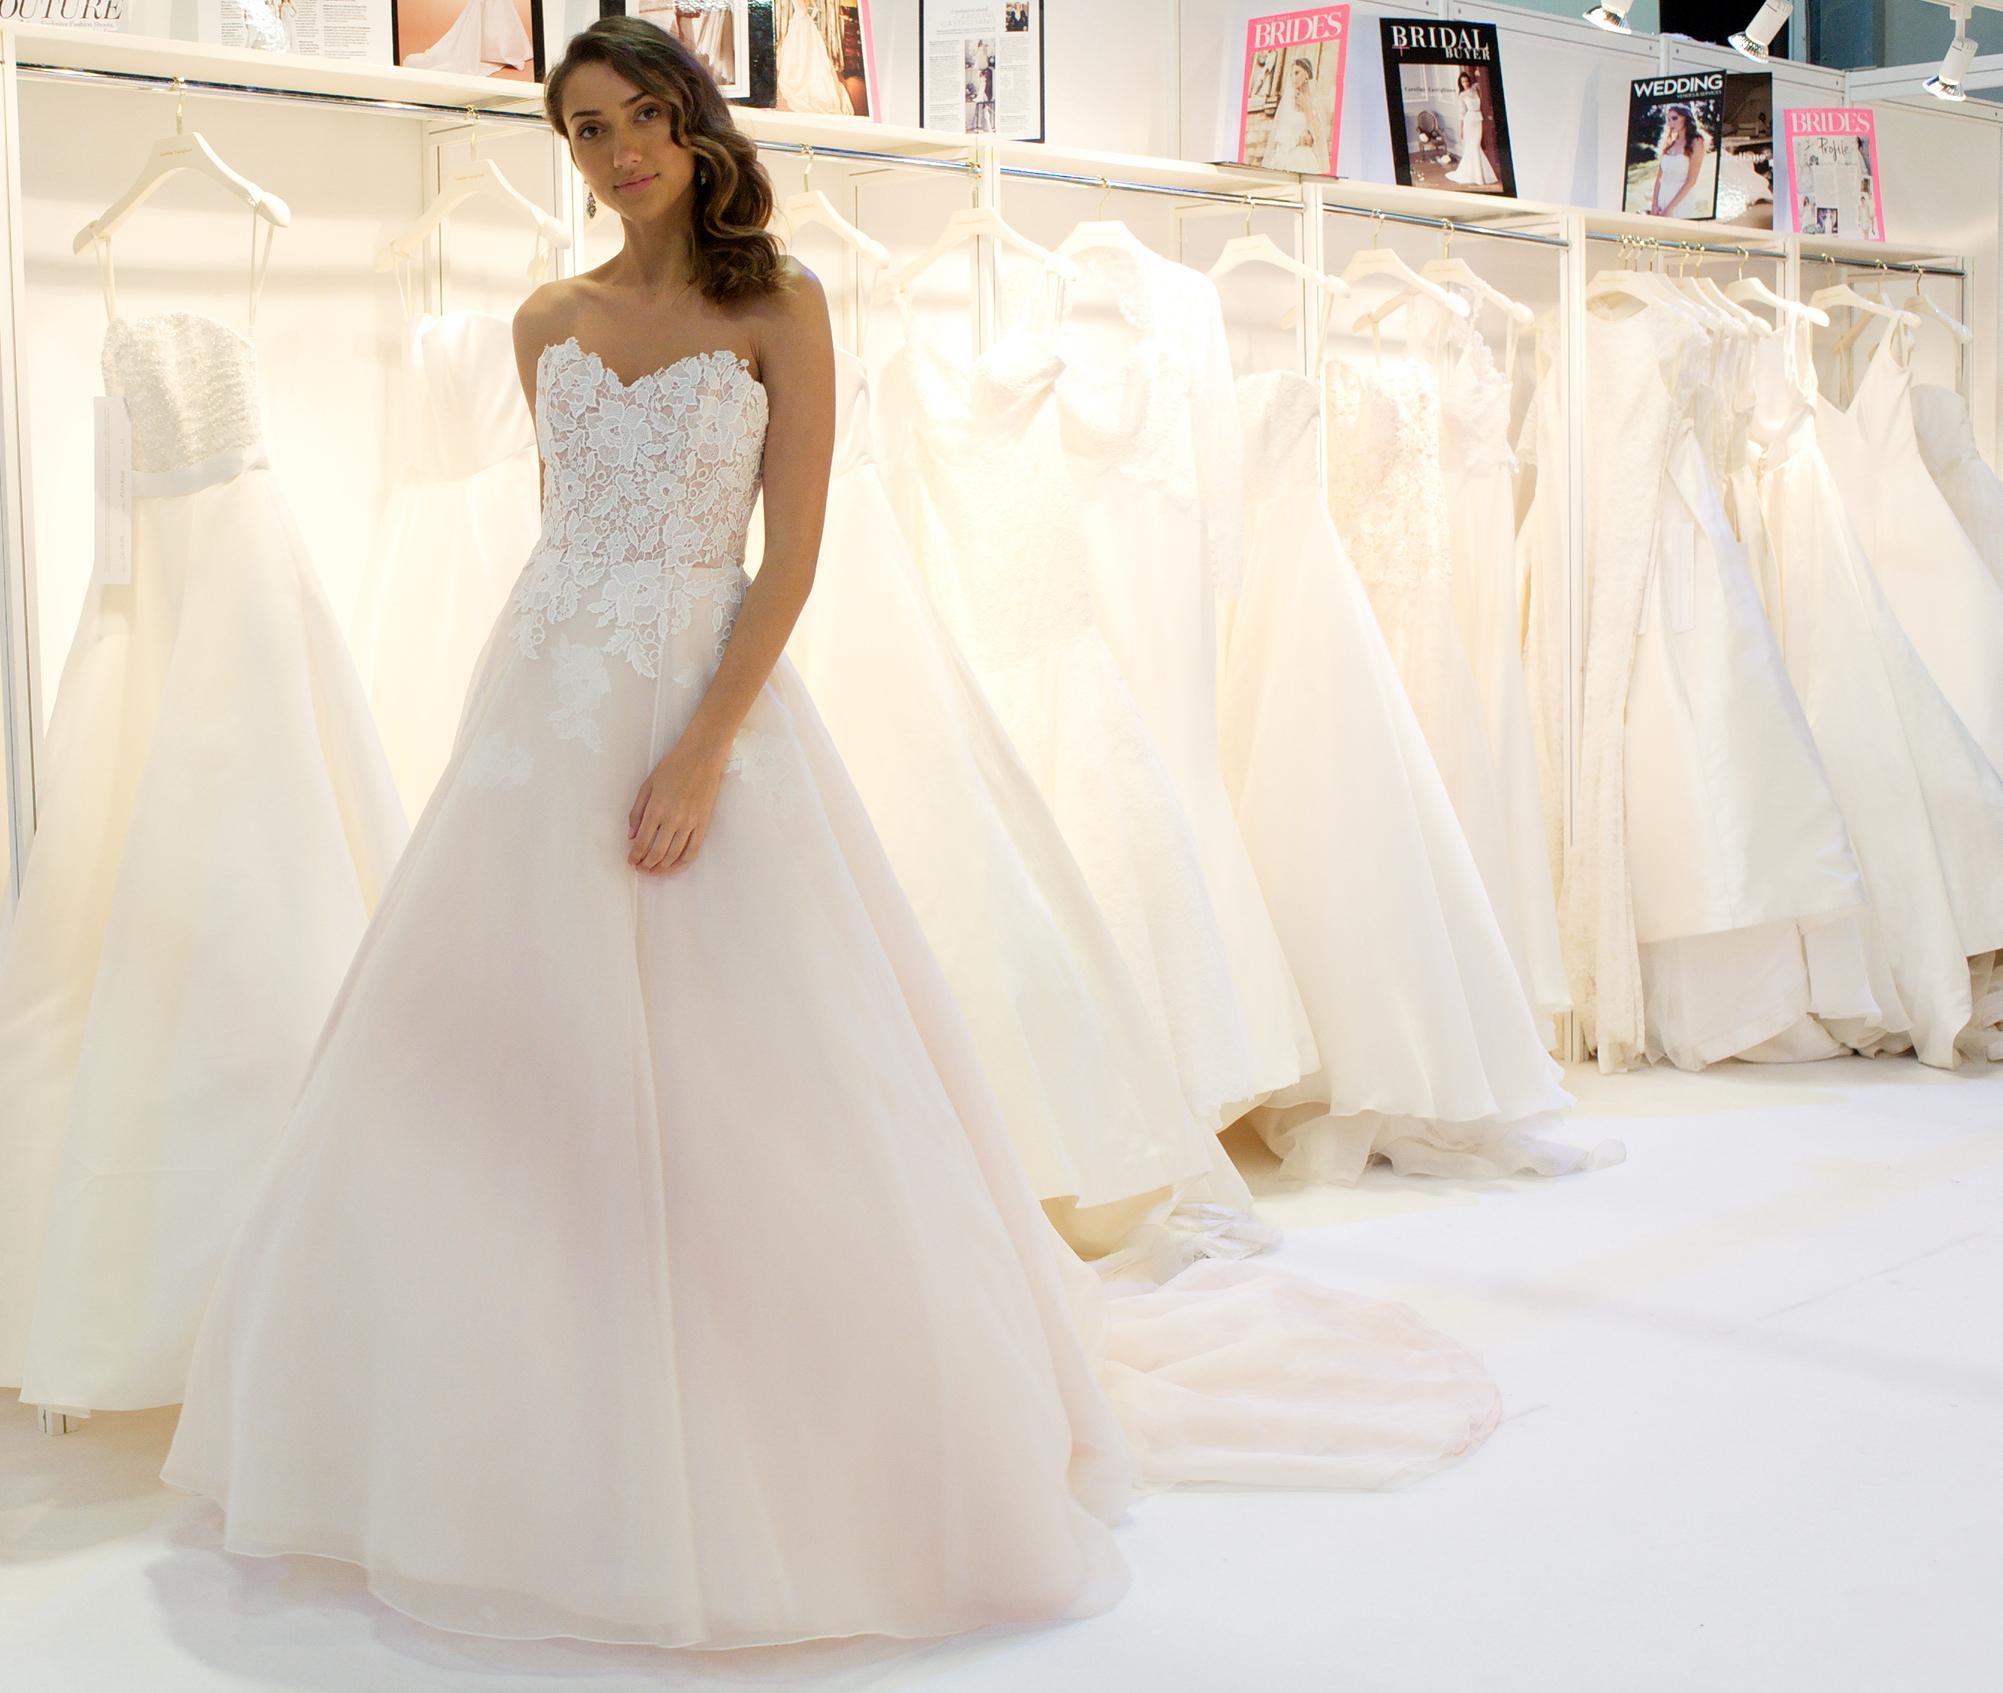 Anniversary designer wedding dresses by Caroline Castigliano